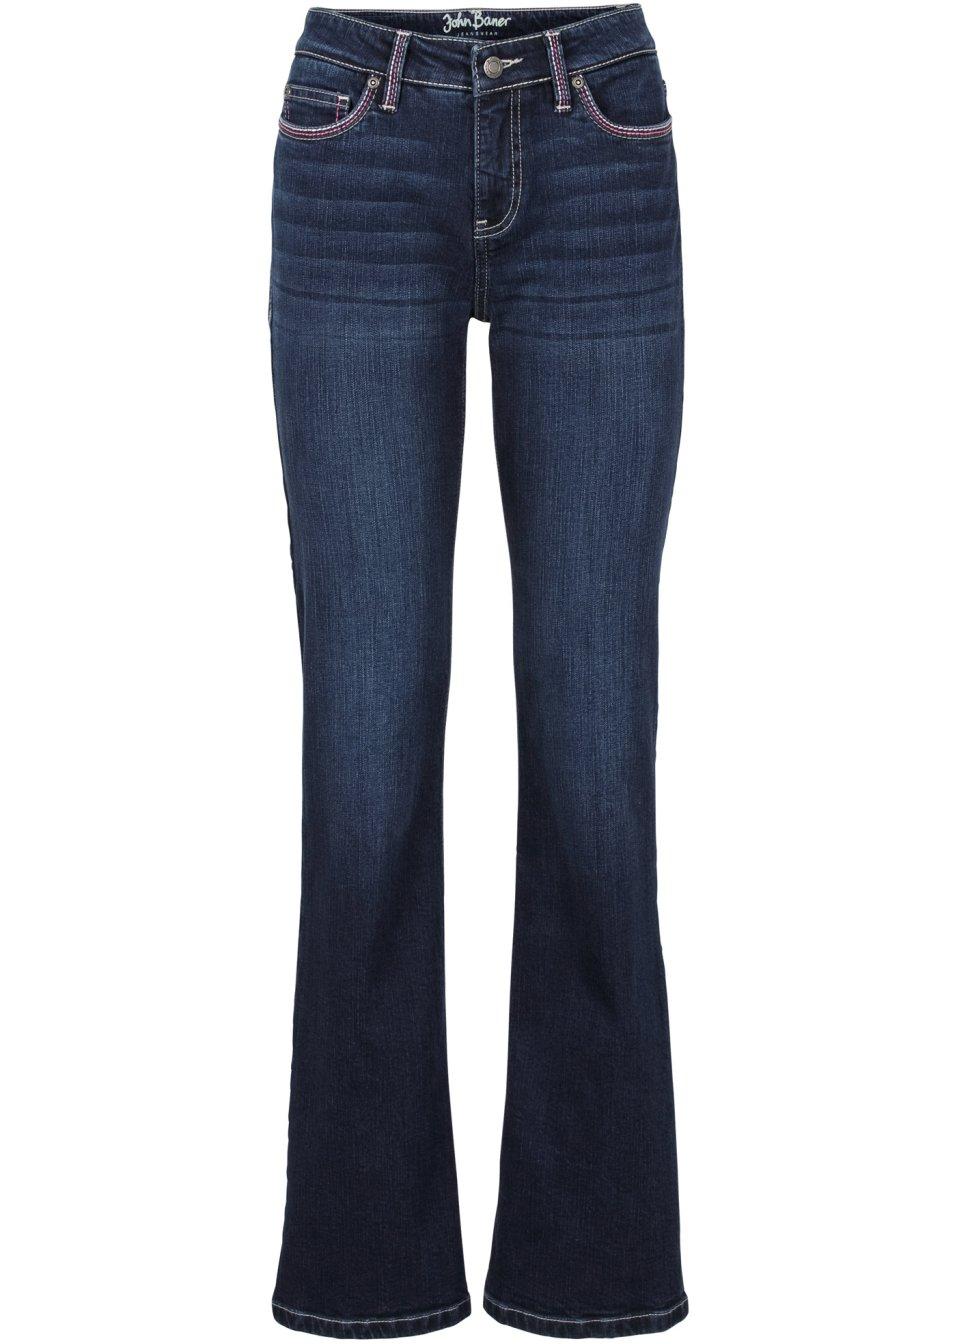 sportliche jeans mit stretch anteil dunkelblau normal. Black Bedroom Furniture Sets. Home Design Ideas